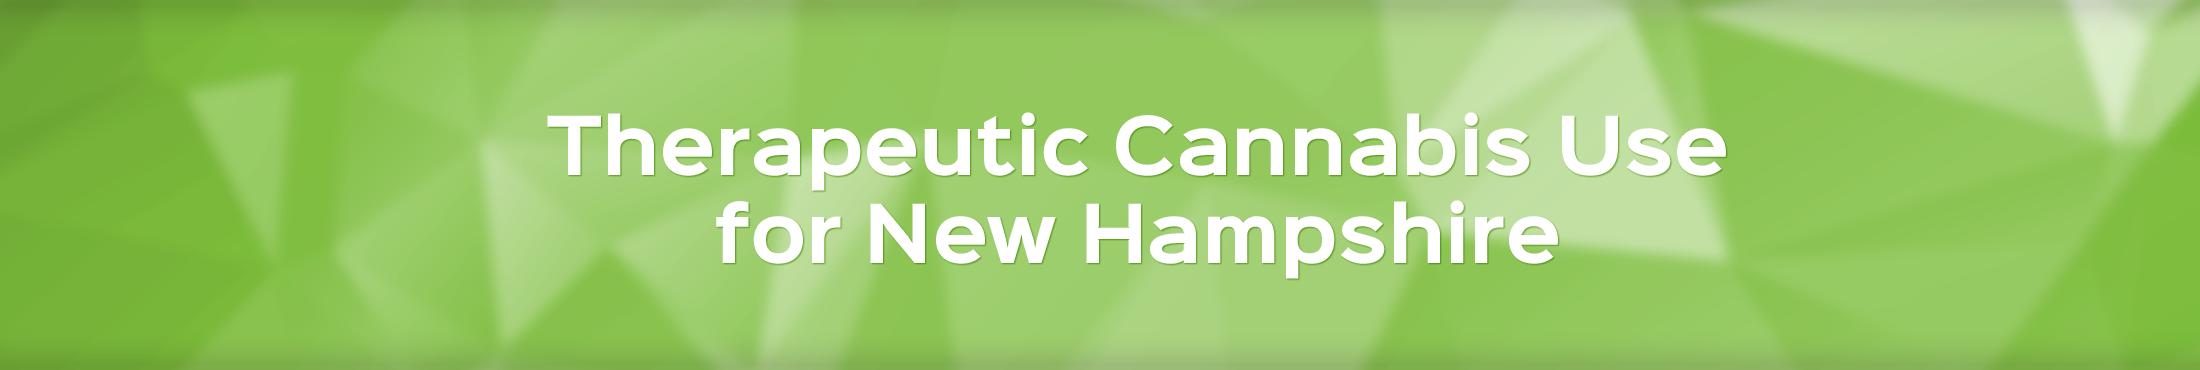 Therapeutic cannabis in New Hampshire